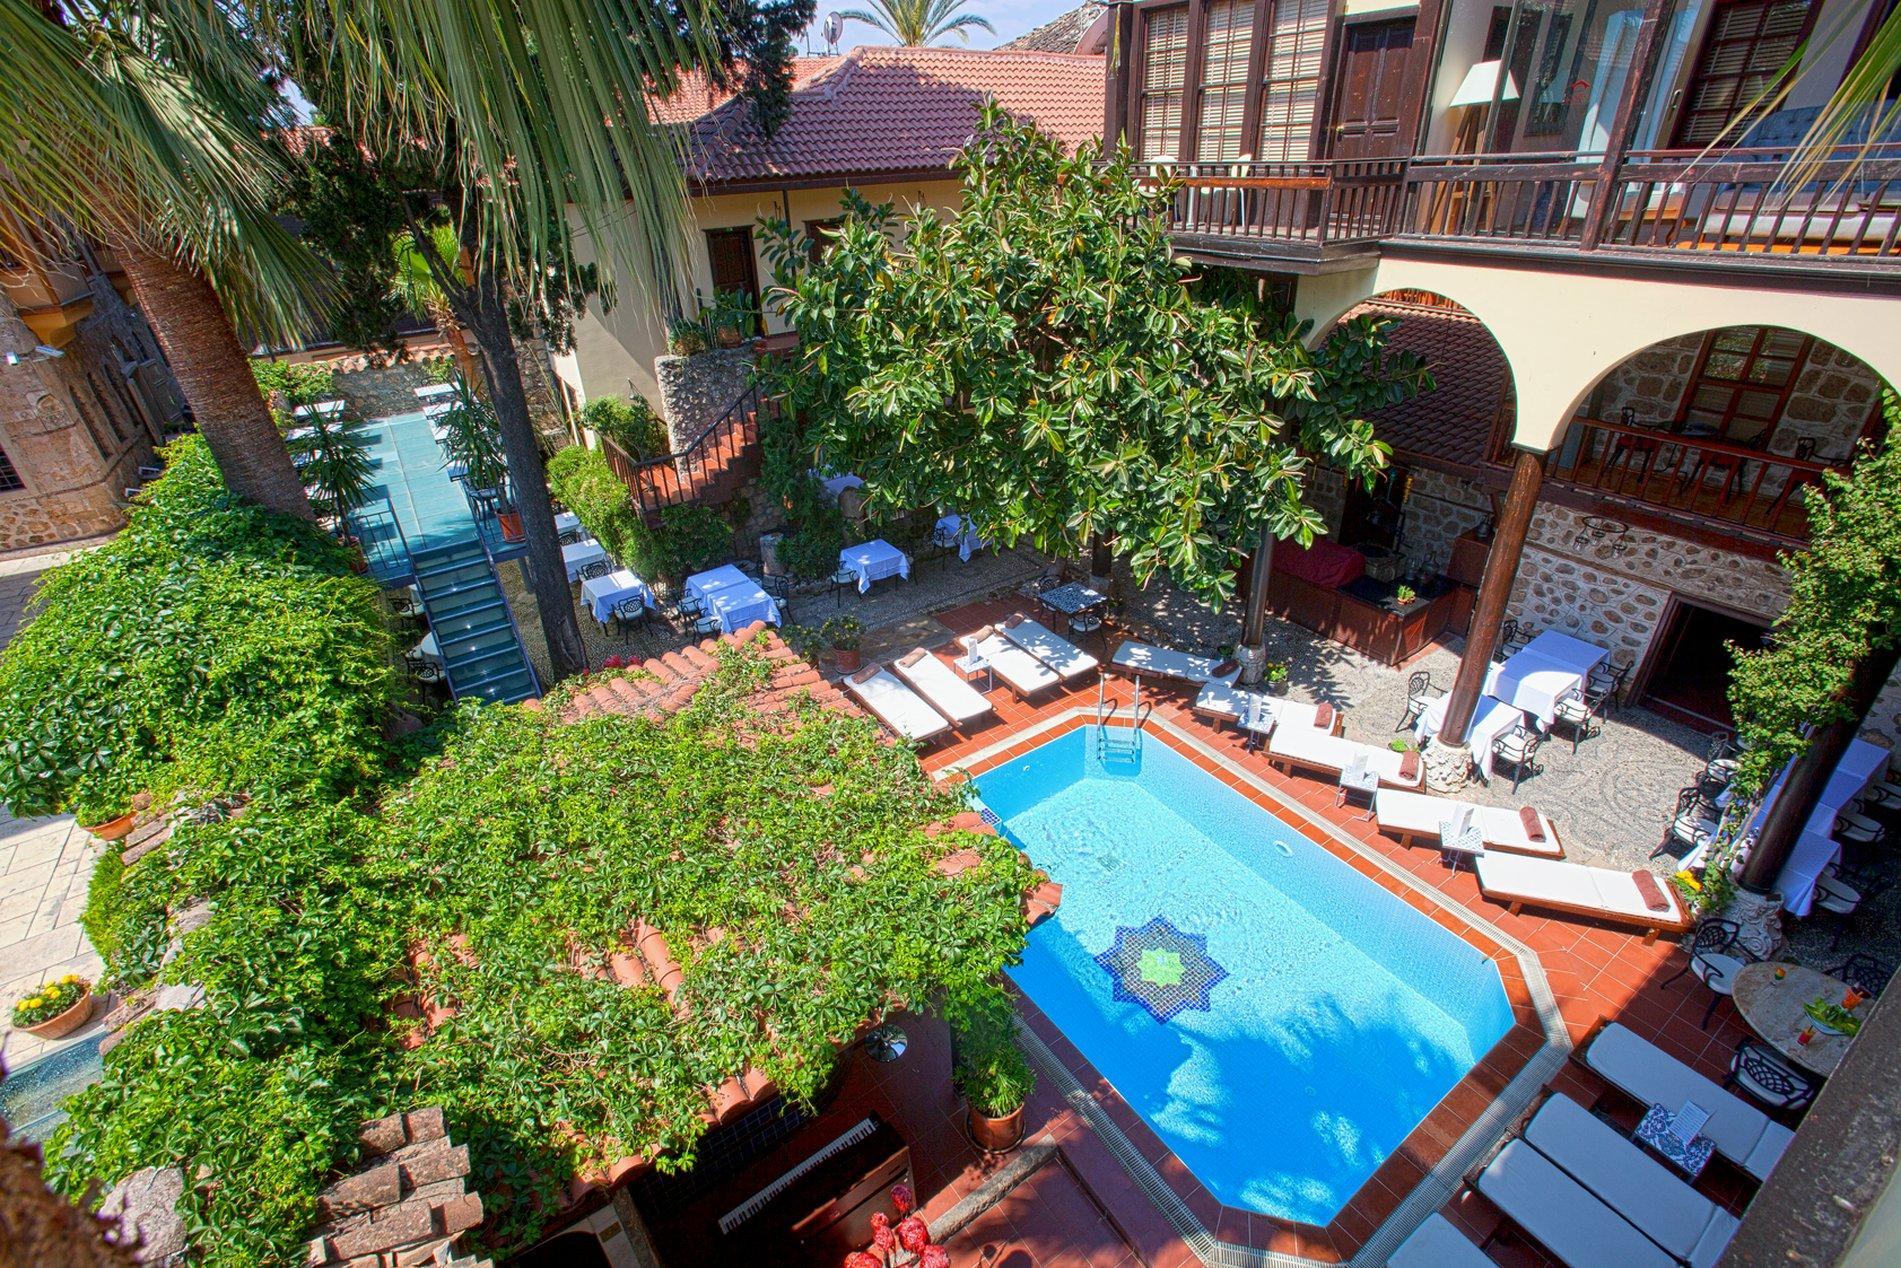 Alp Pasa Hotel - Turkey - Antalya